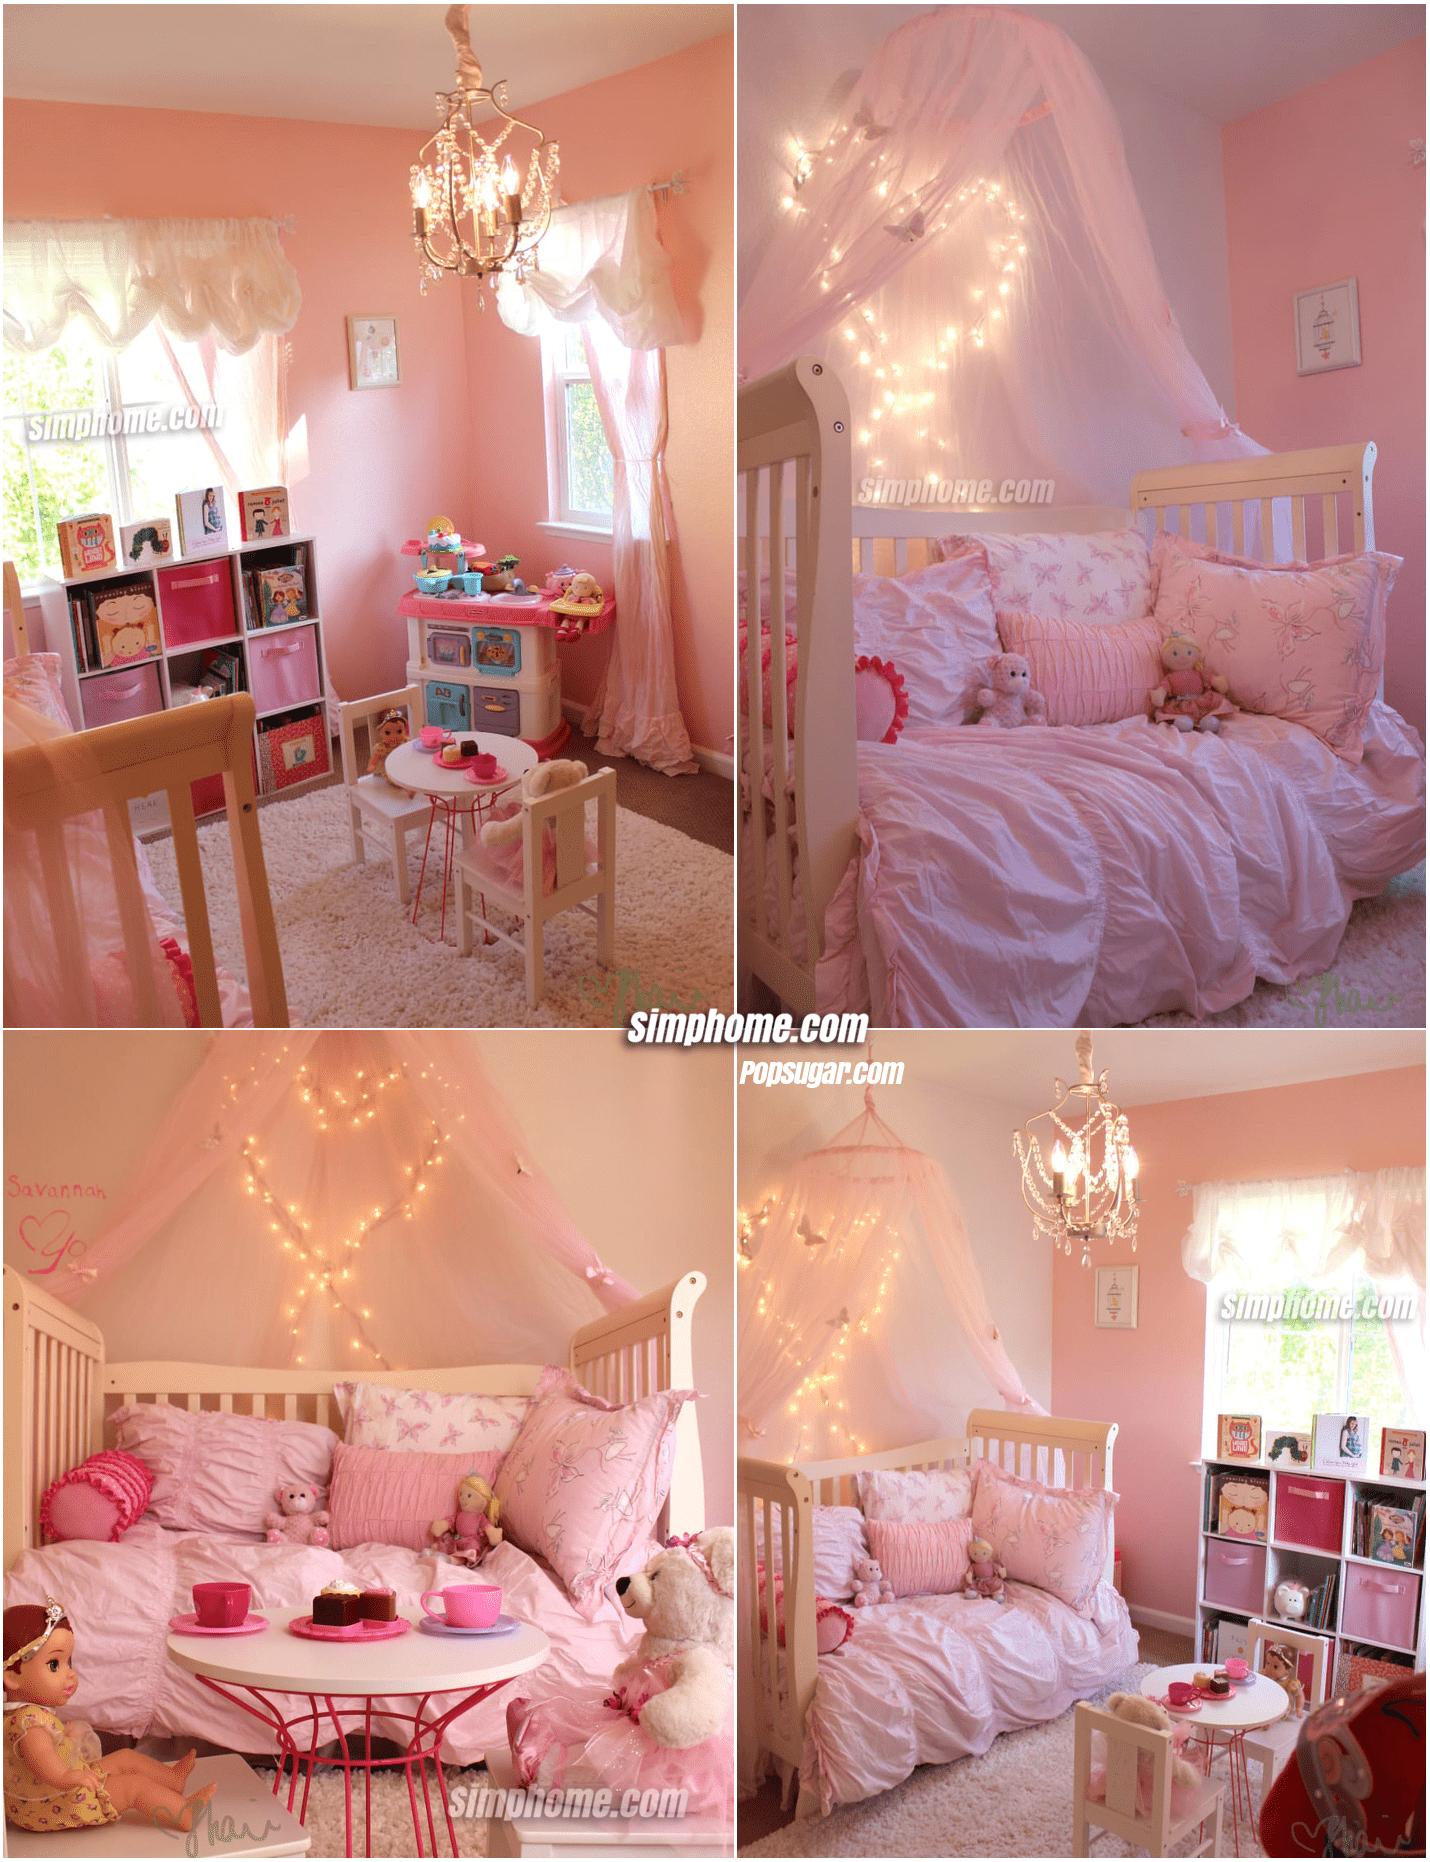 2.Simphome.com Chic Pink Girls Bedroom